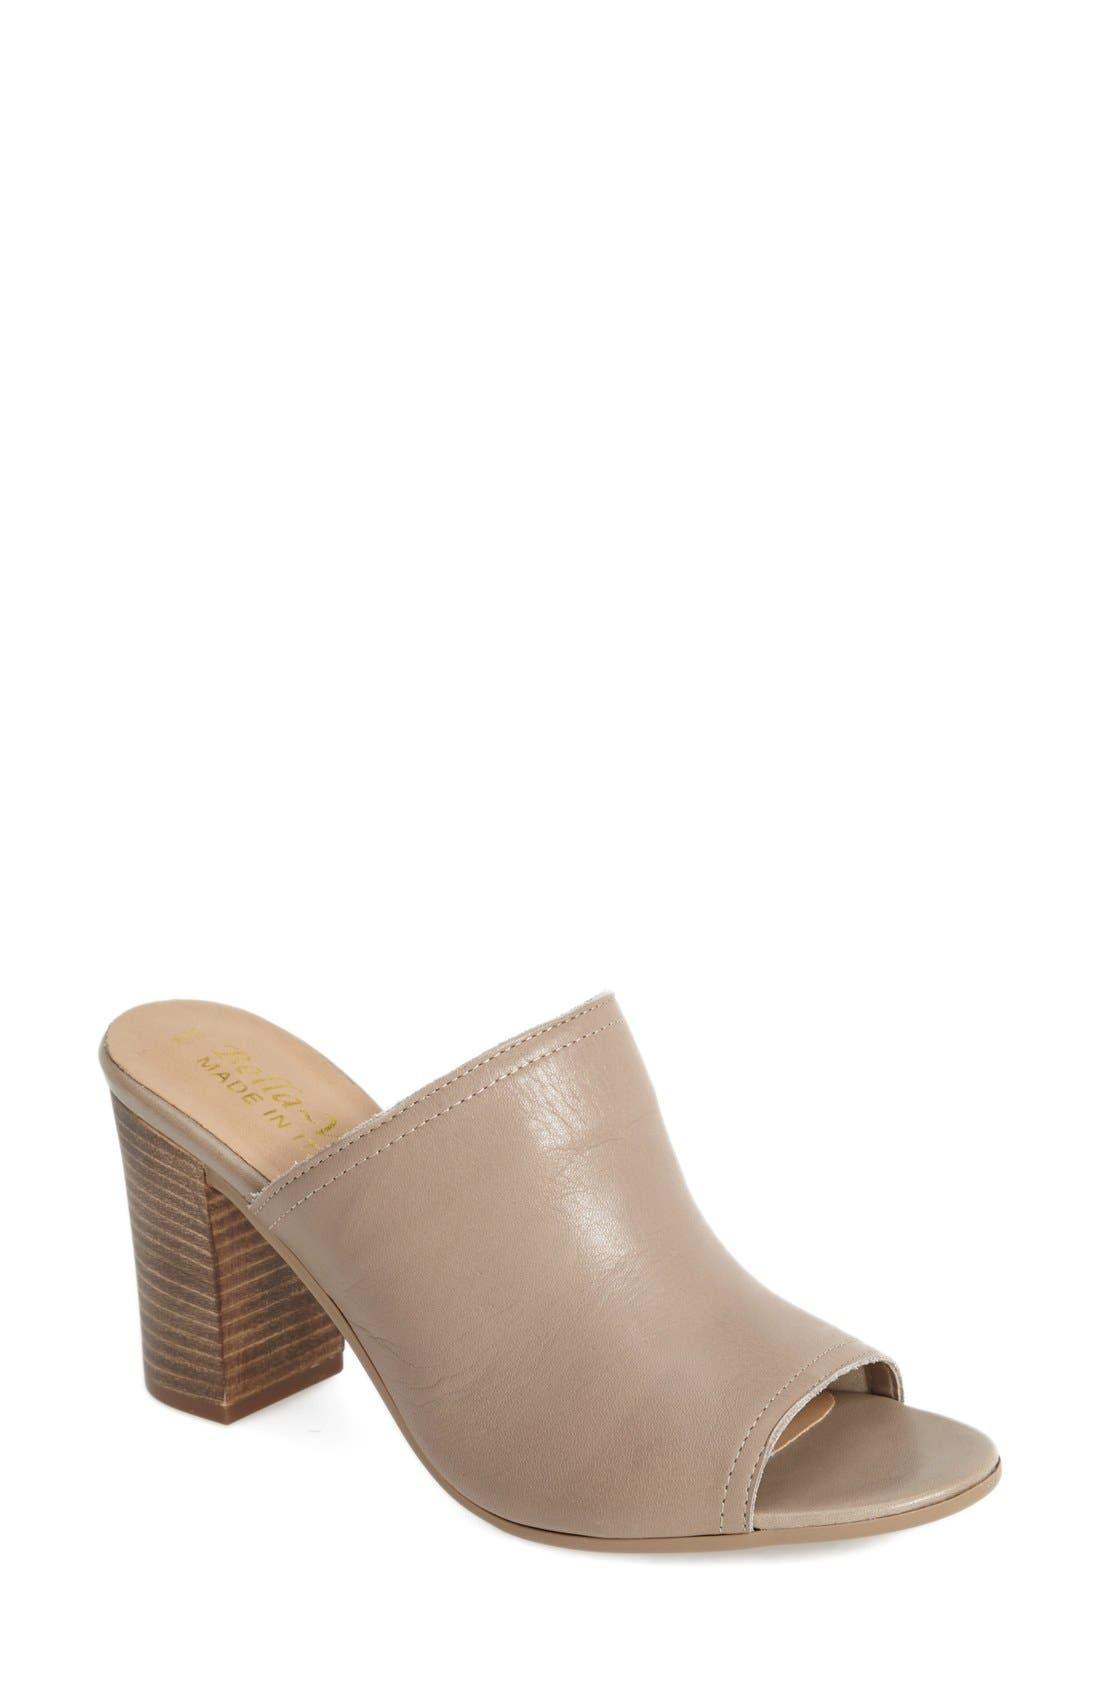 Alternate Image 1 Selected - Bella Vita 'Arno' Leather Mule (Women)